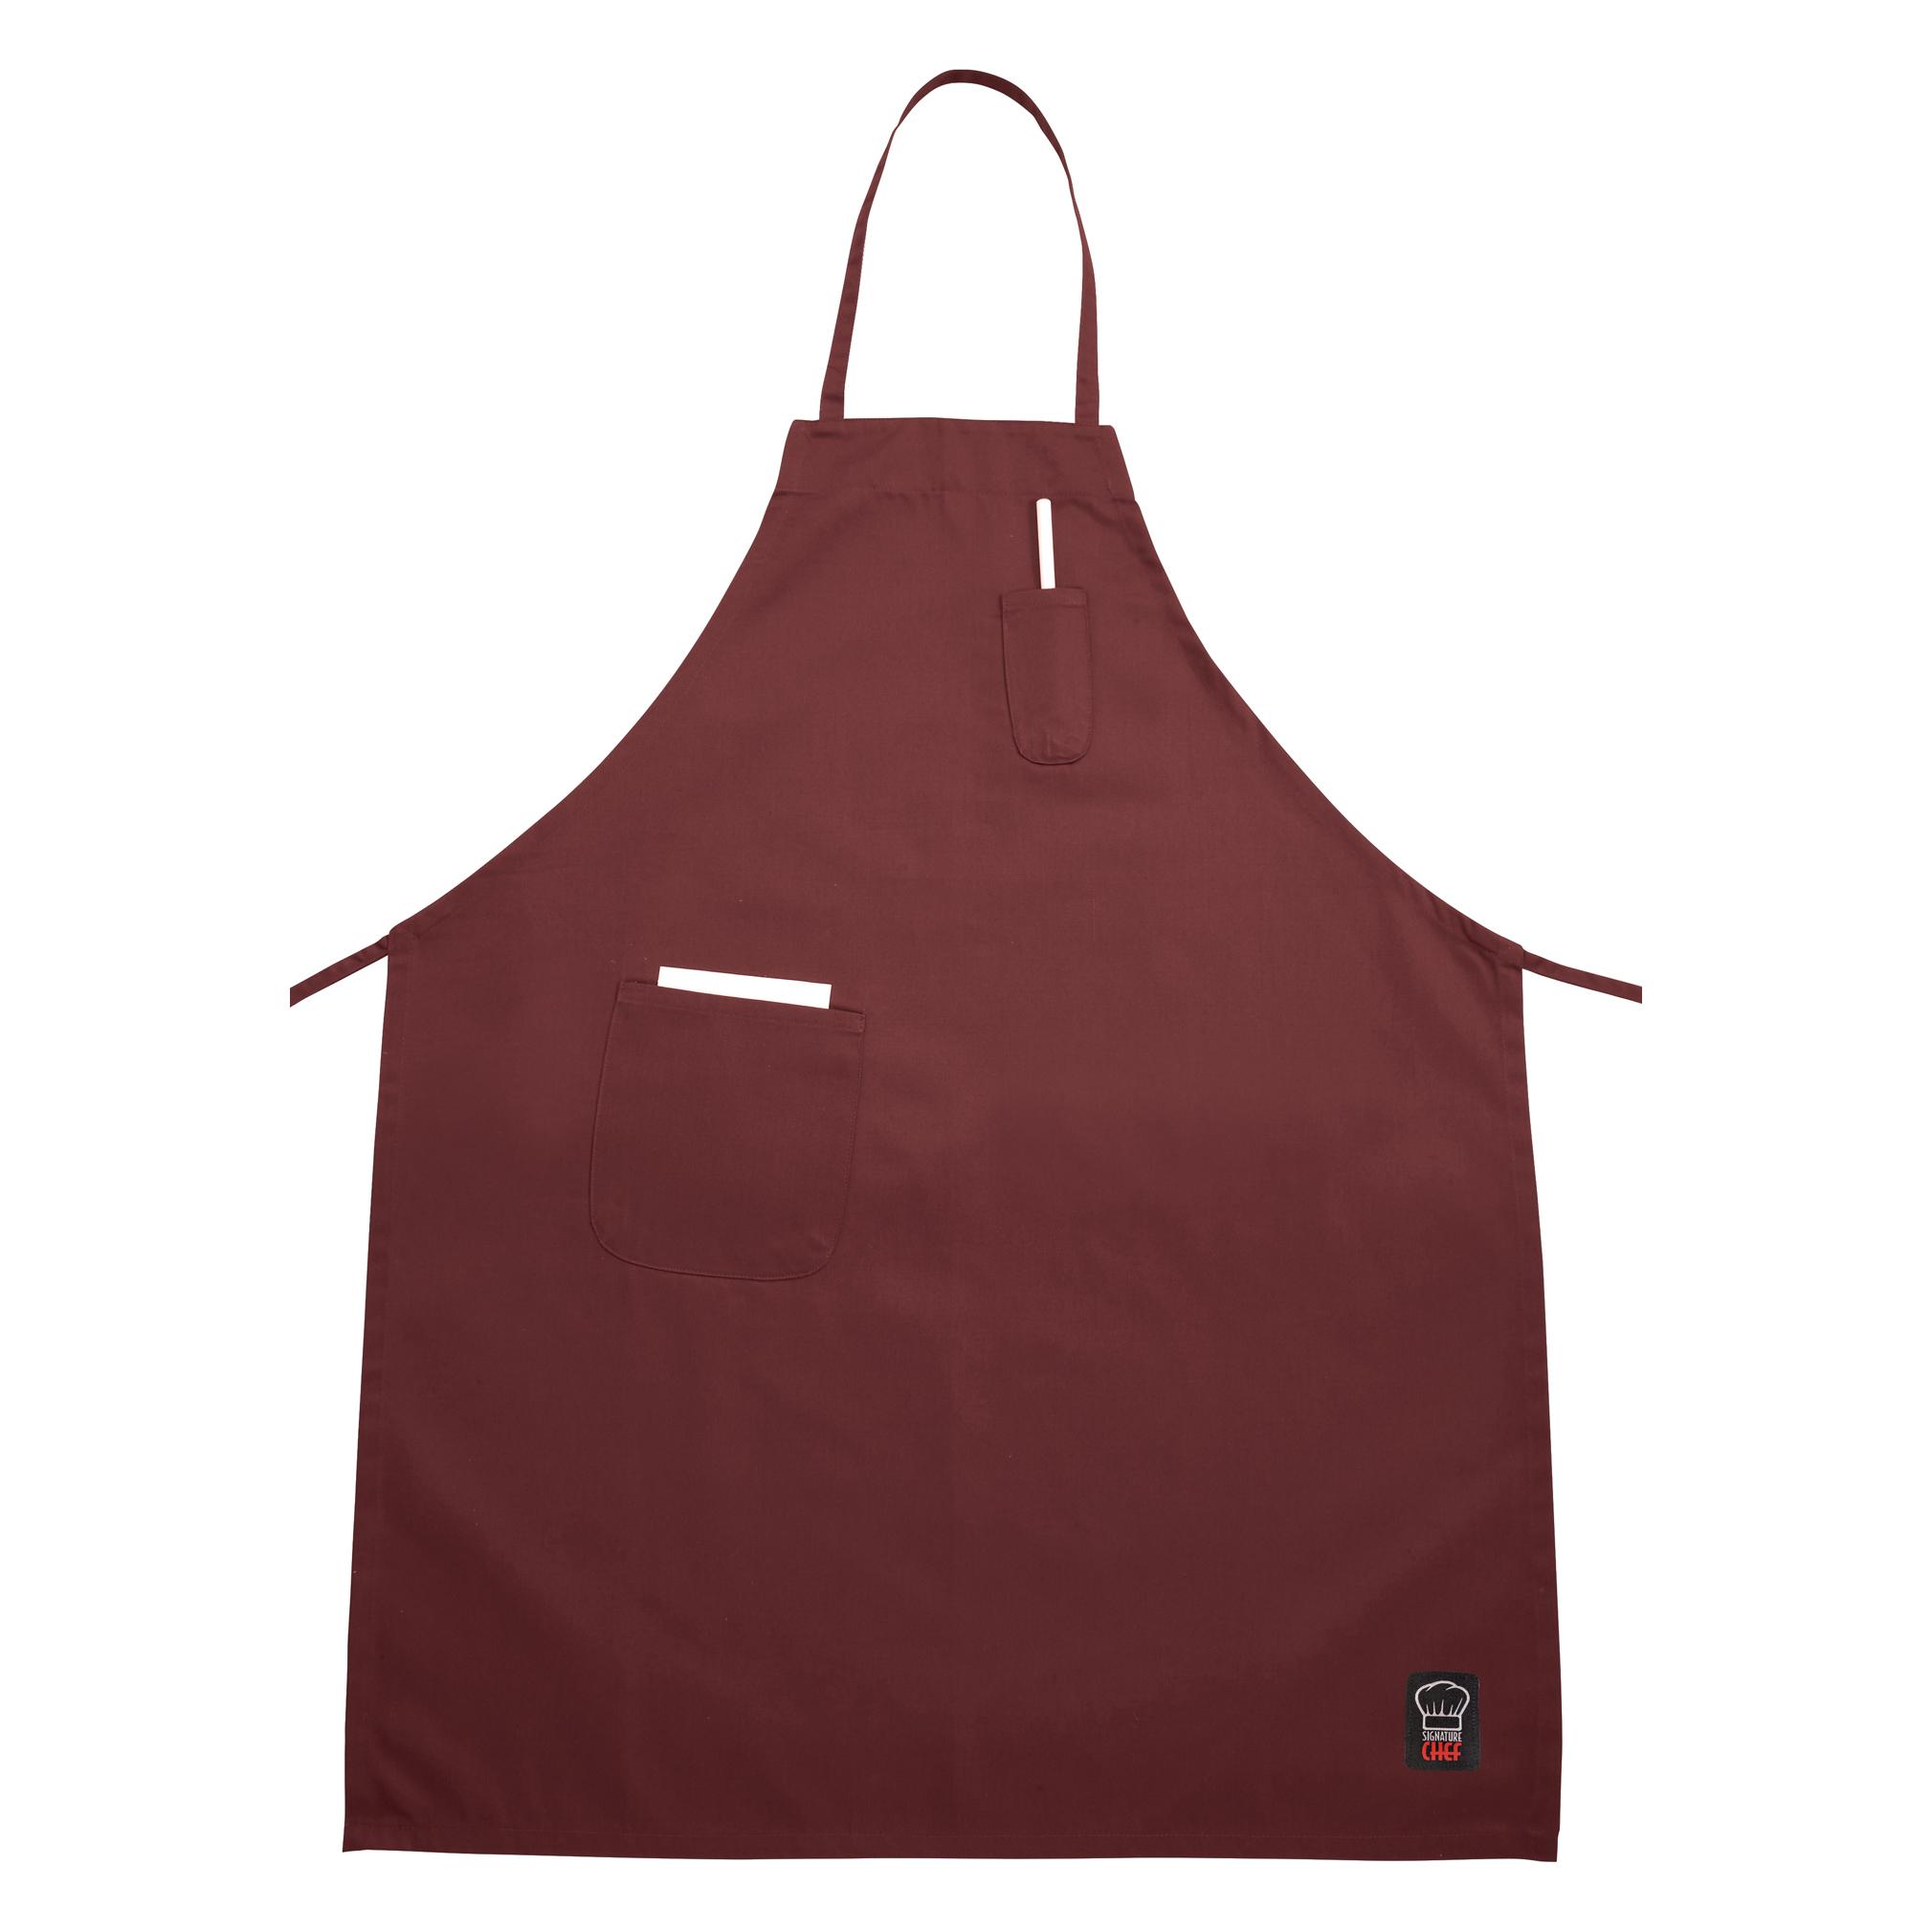 Winco BA-PBG bib apron